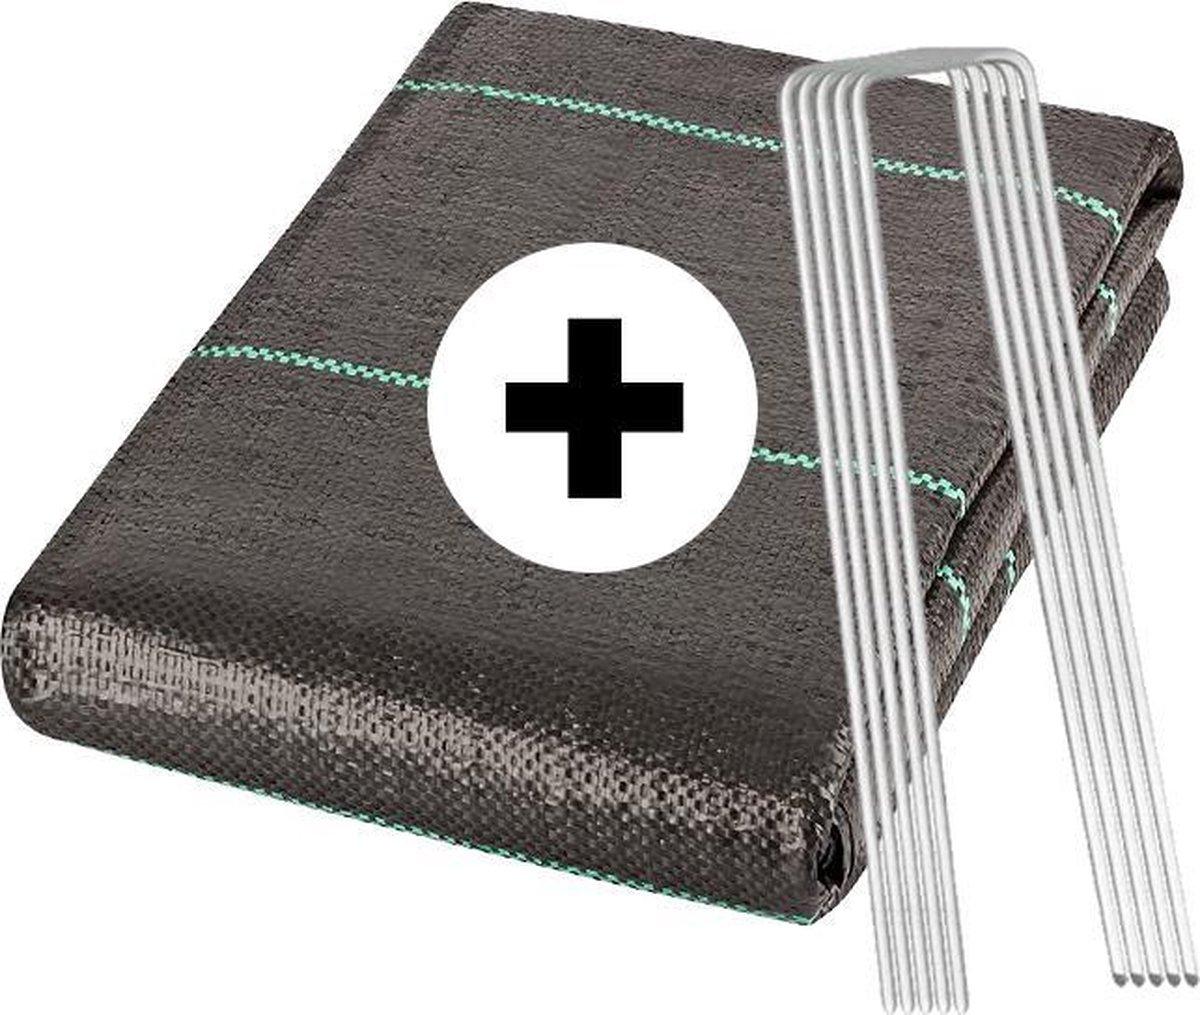 YUGN Anti Worteldoek 4x5M en 60 Gronddoekpennen - Duurzaam Gronddoek en Bodembedekker - Ideale Onkru